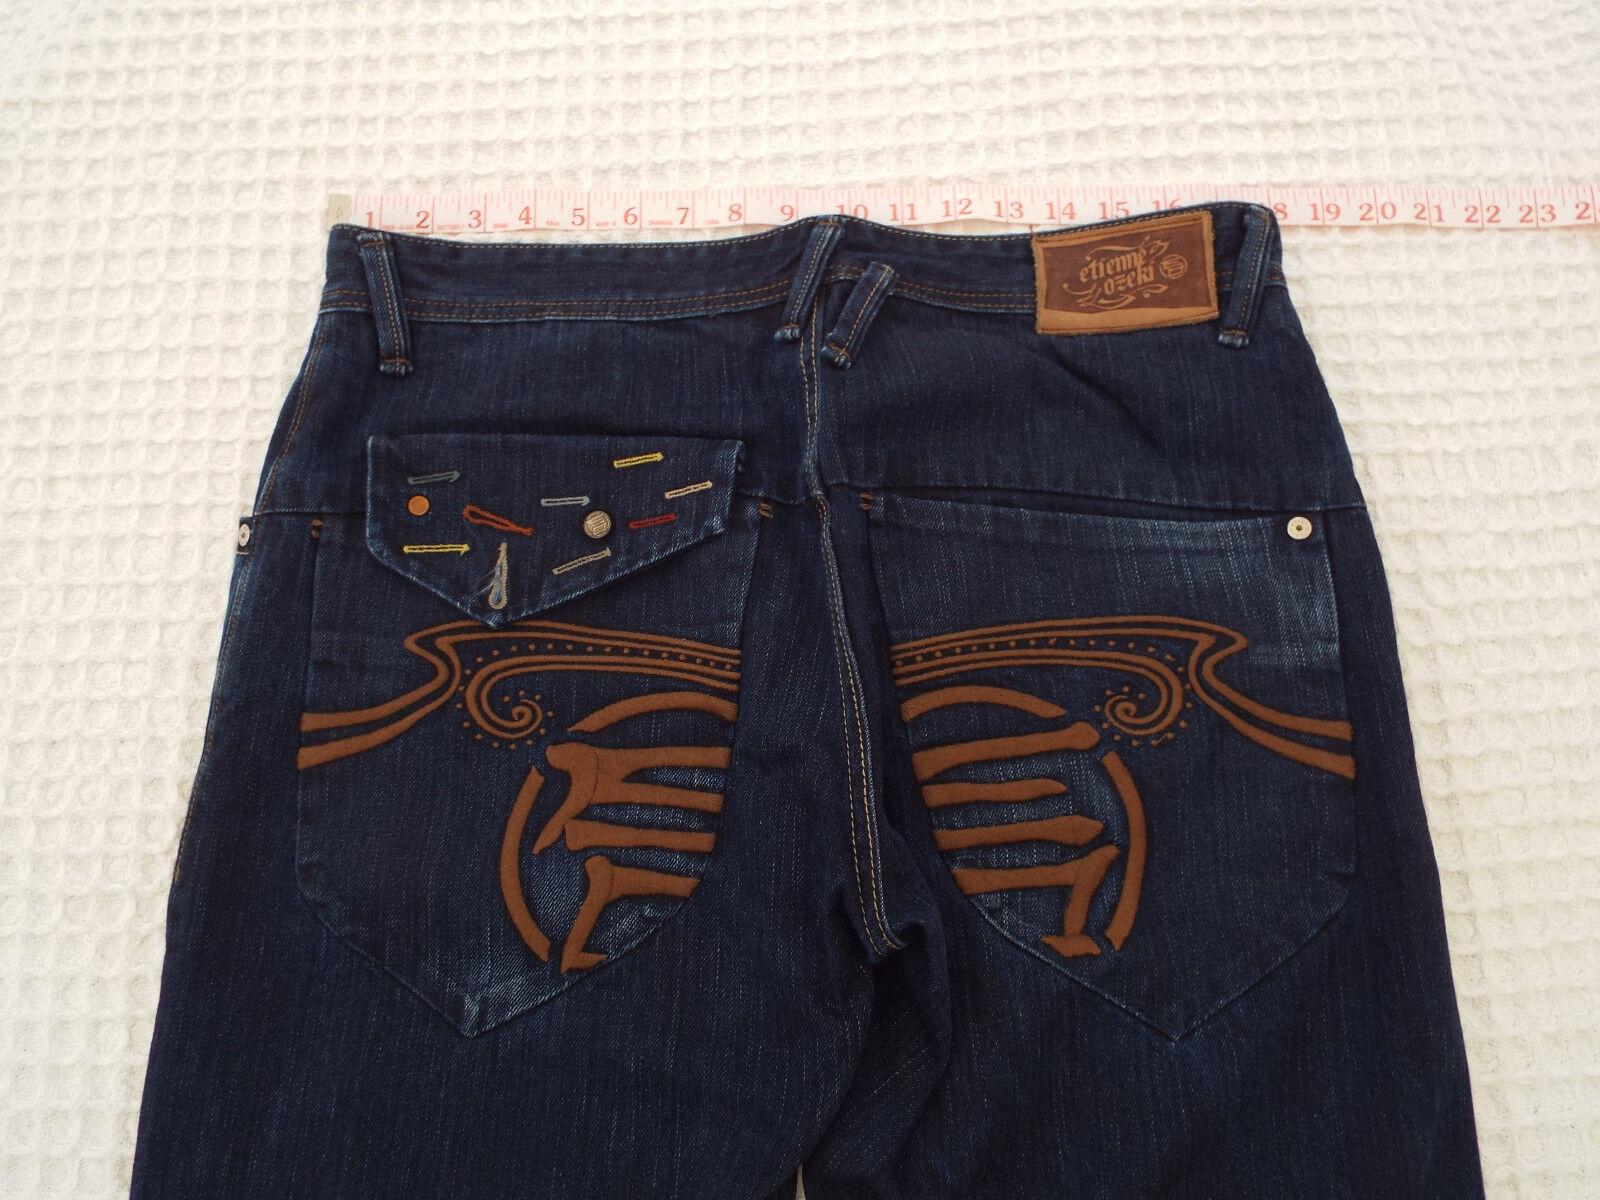 ETIENNE OZEKI Mens NEW DALLAS FIT Jeans  Size W34-36 L32  RRP -150+